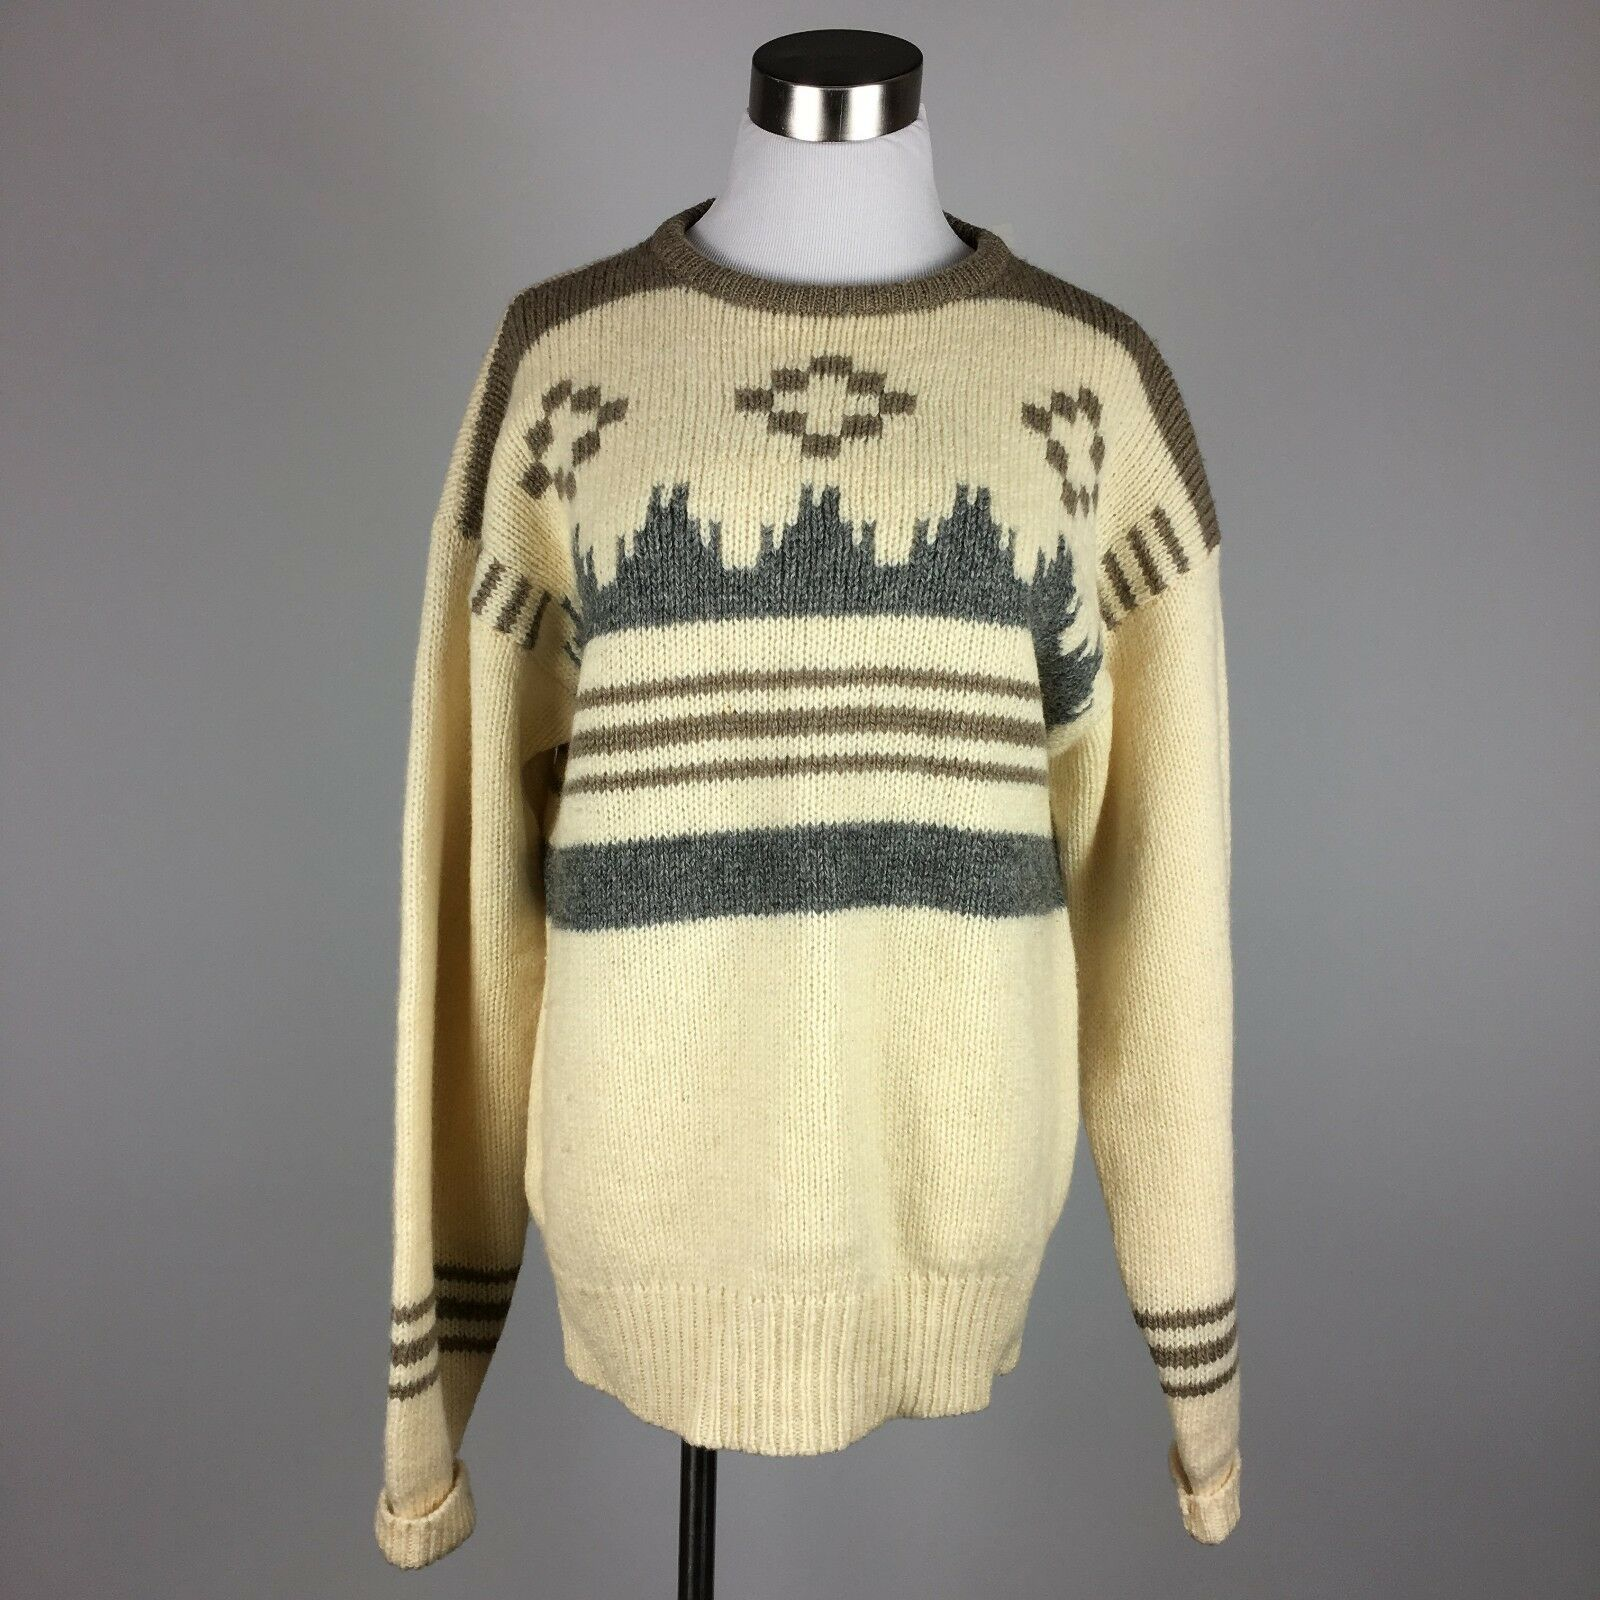 Pringle Sports Scotland  Herren Vtg Pullover Sweater L Shetland Wool Braun Taupe